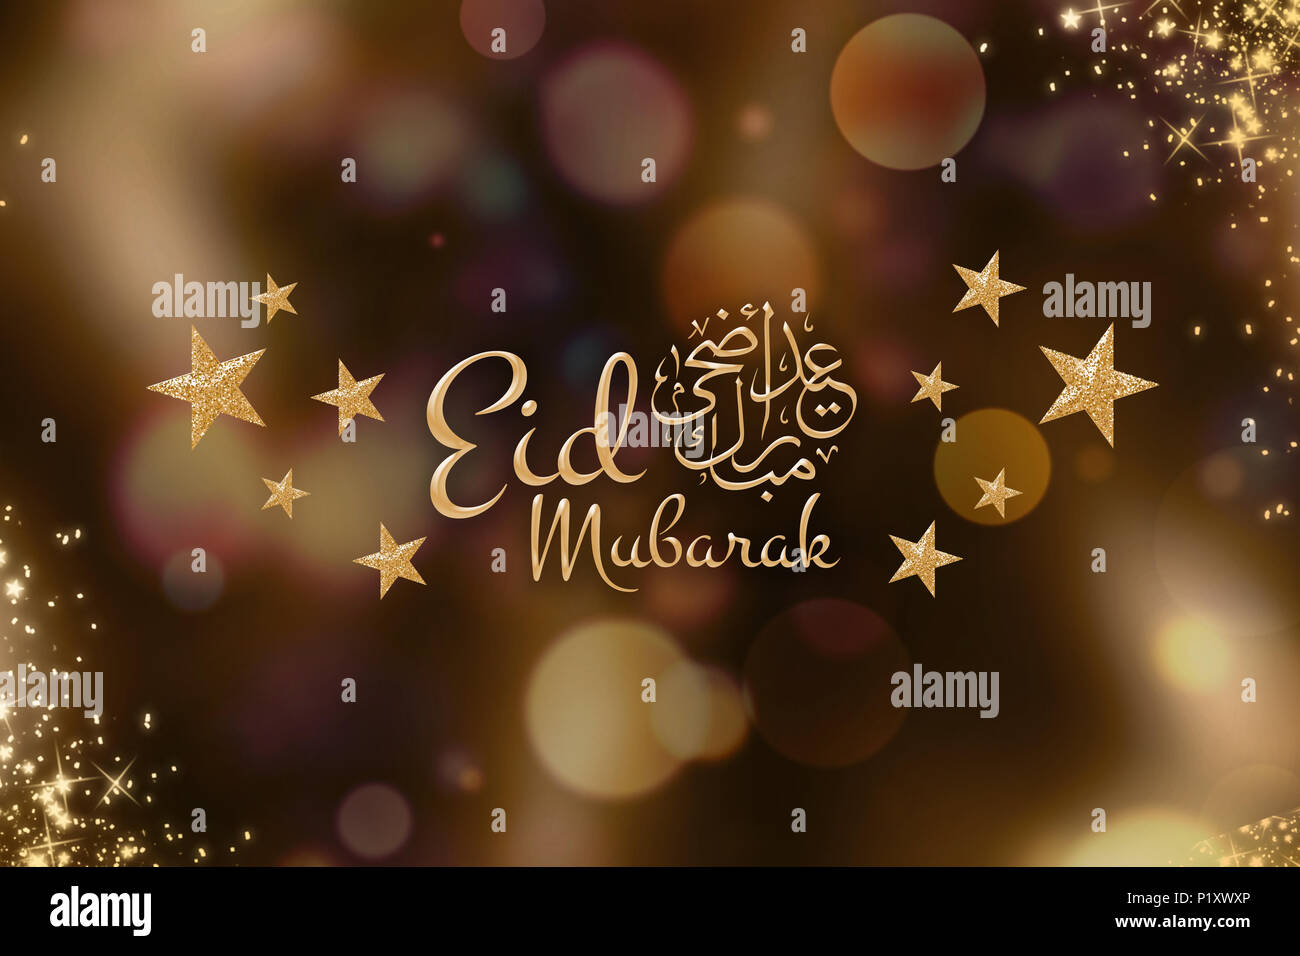 Eid Mubarak Greetings In Golden Background Arabic Calligraphy